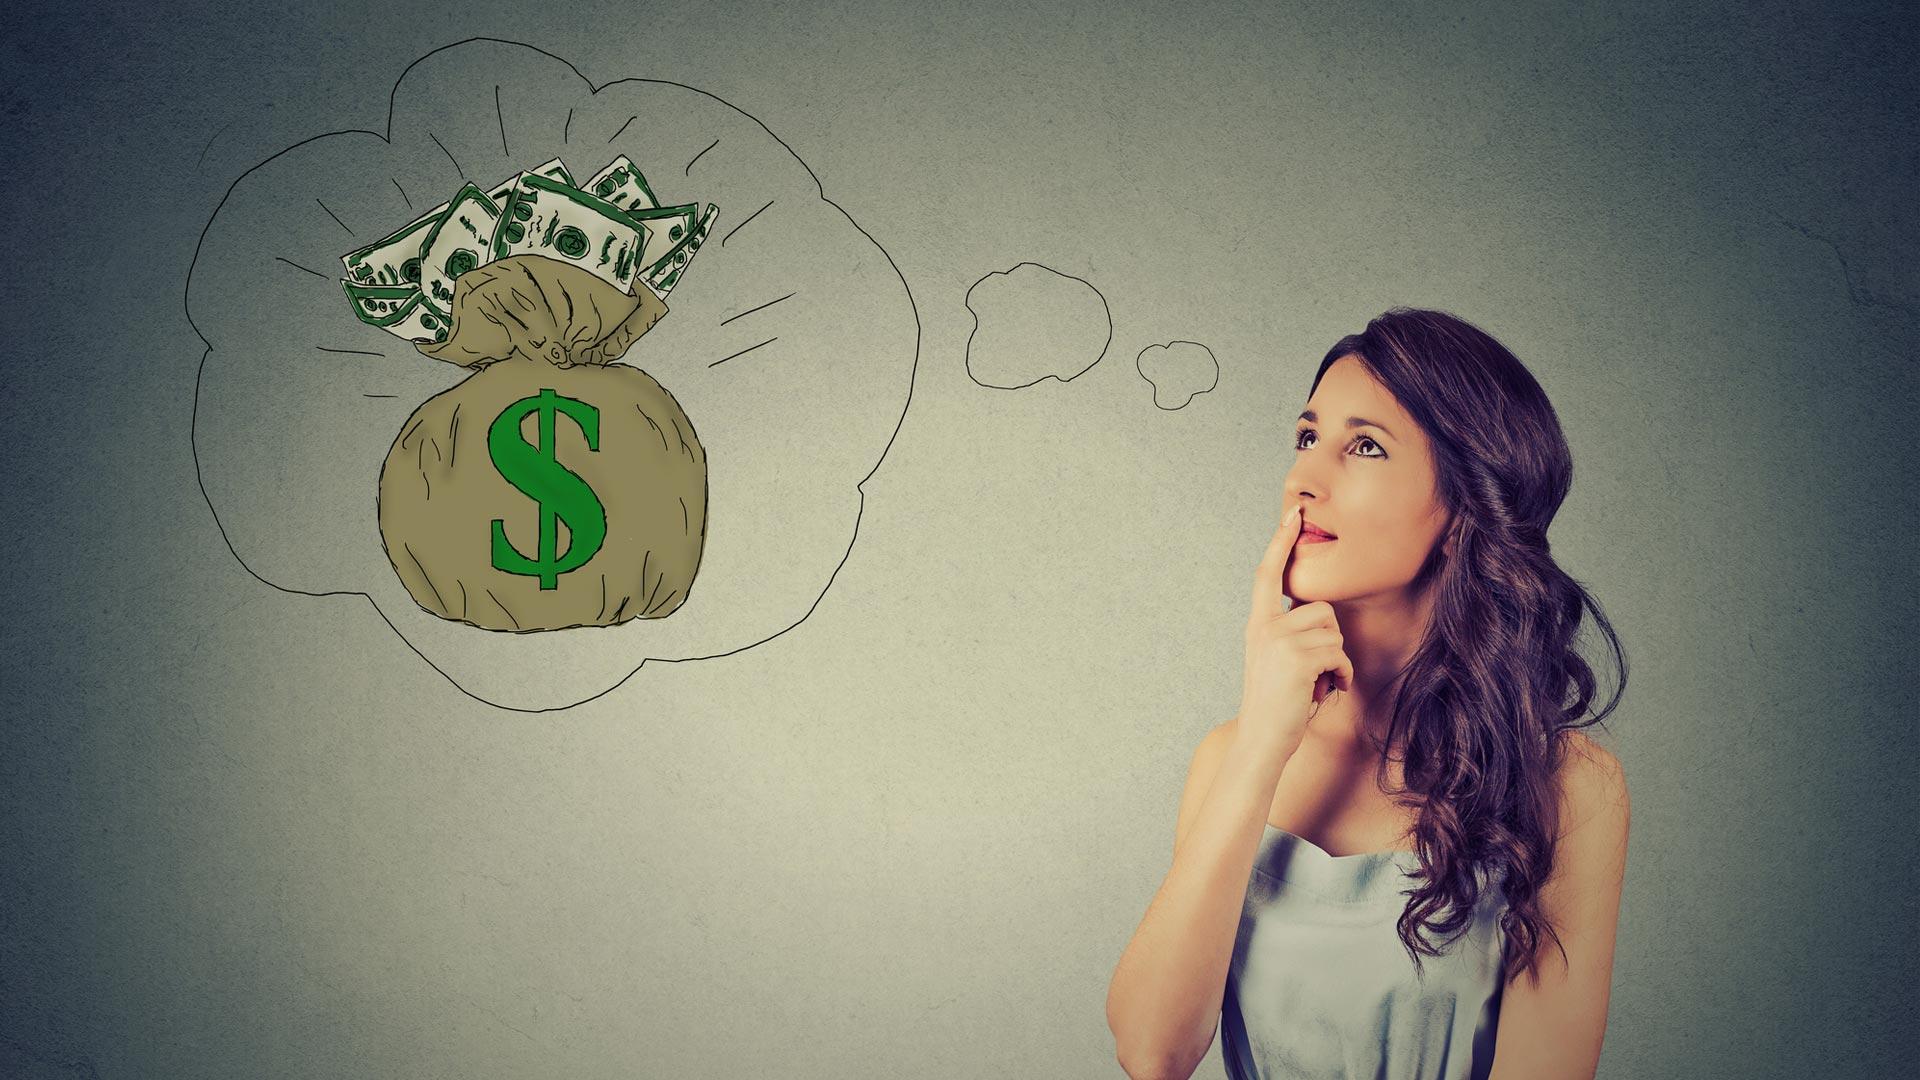 Gana dinero extra en Thanksgiving: 6 ideas de negocios